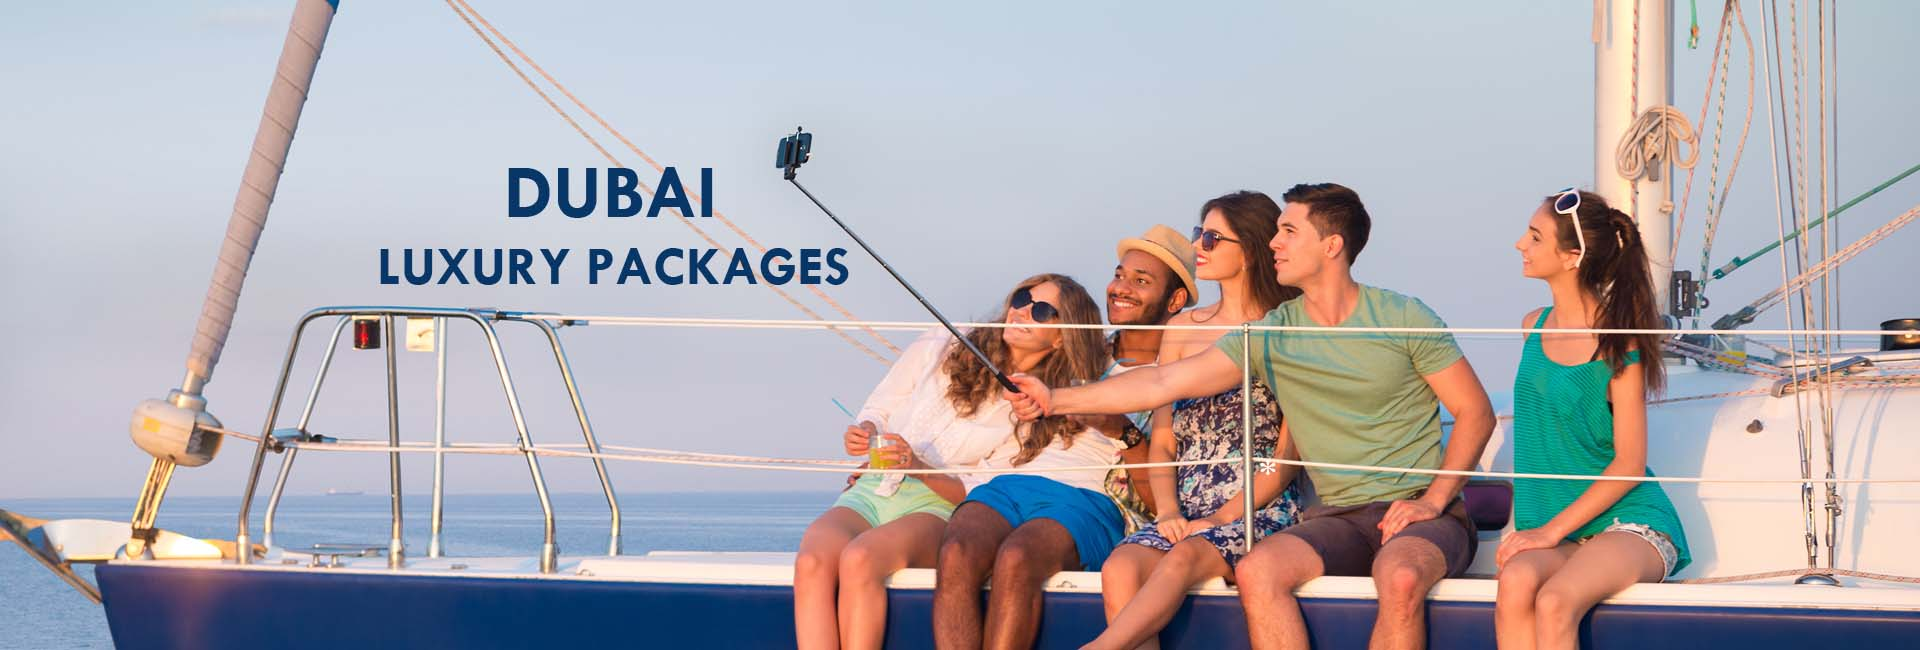 Dubai Luxury Packages